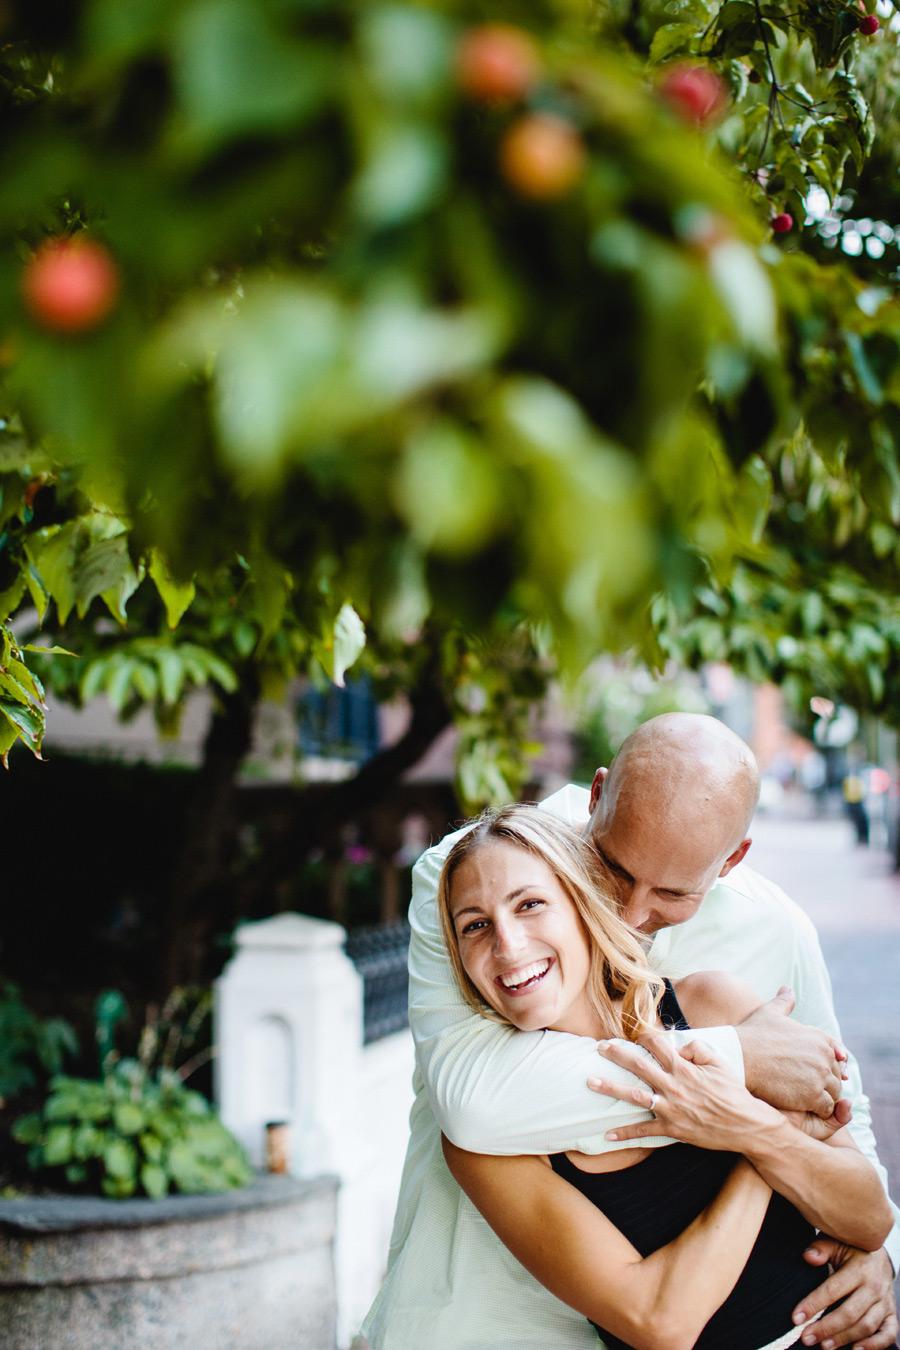 Boston engagement photographers Mikhail Glabets lifestyle couple photography beacon hill